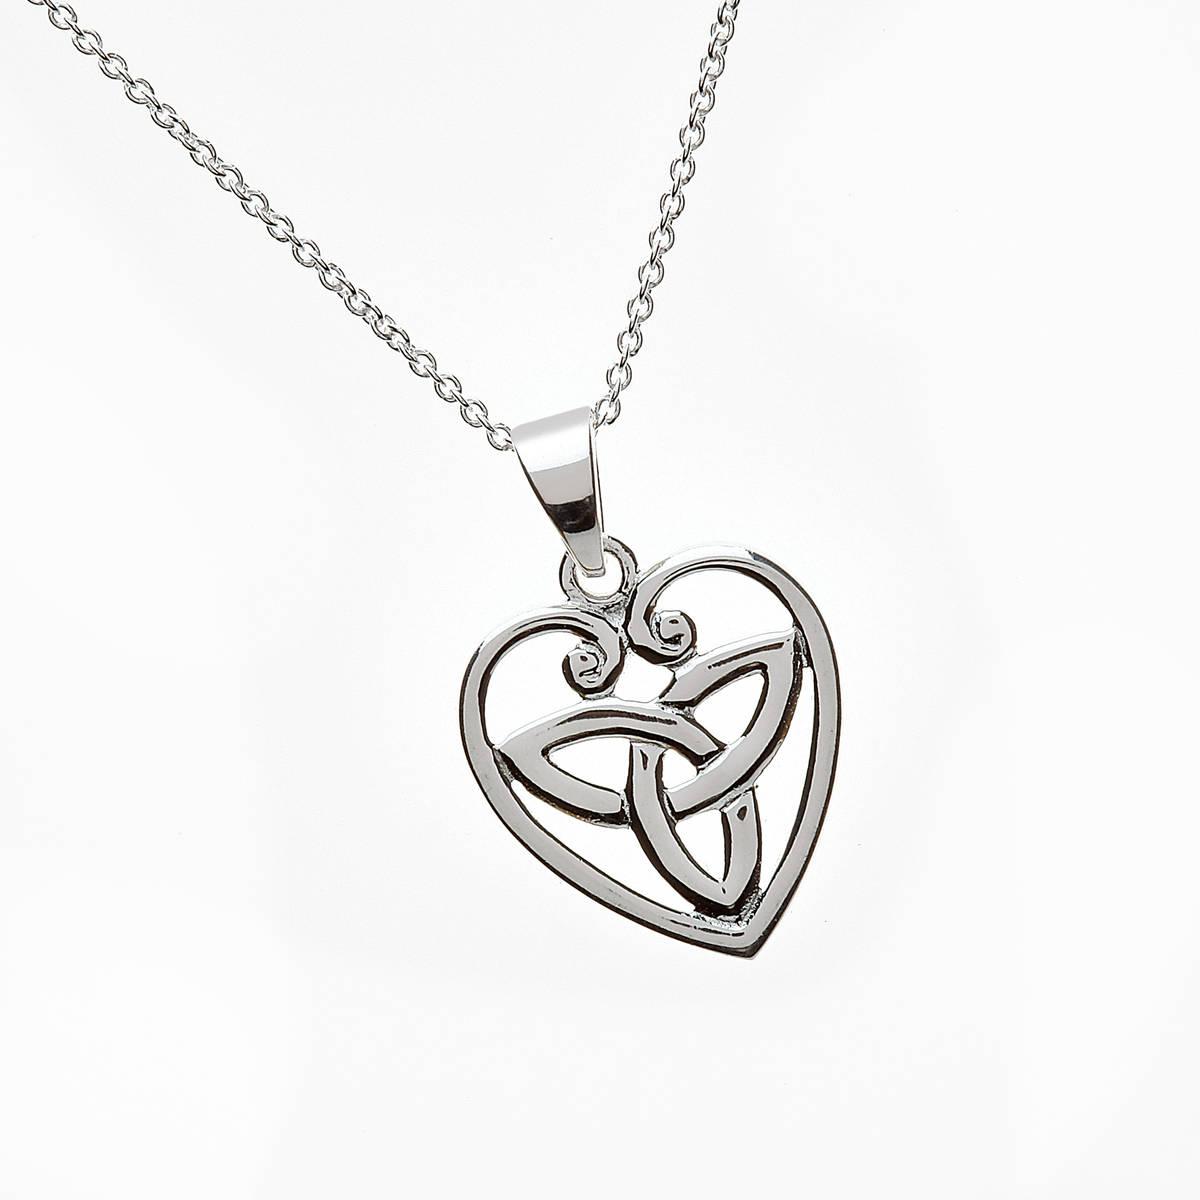 "Silver Trinity Knot Inside Heart Pendant 18"" Trace Chain"